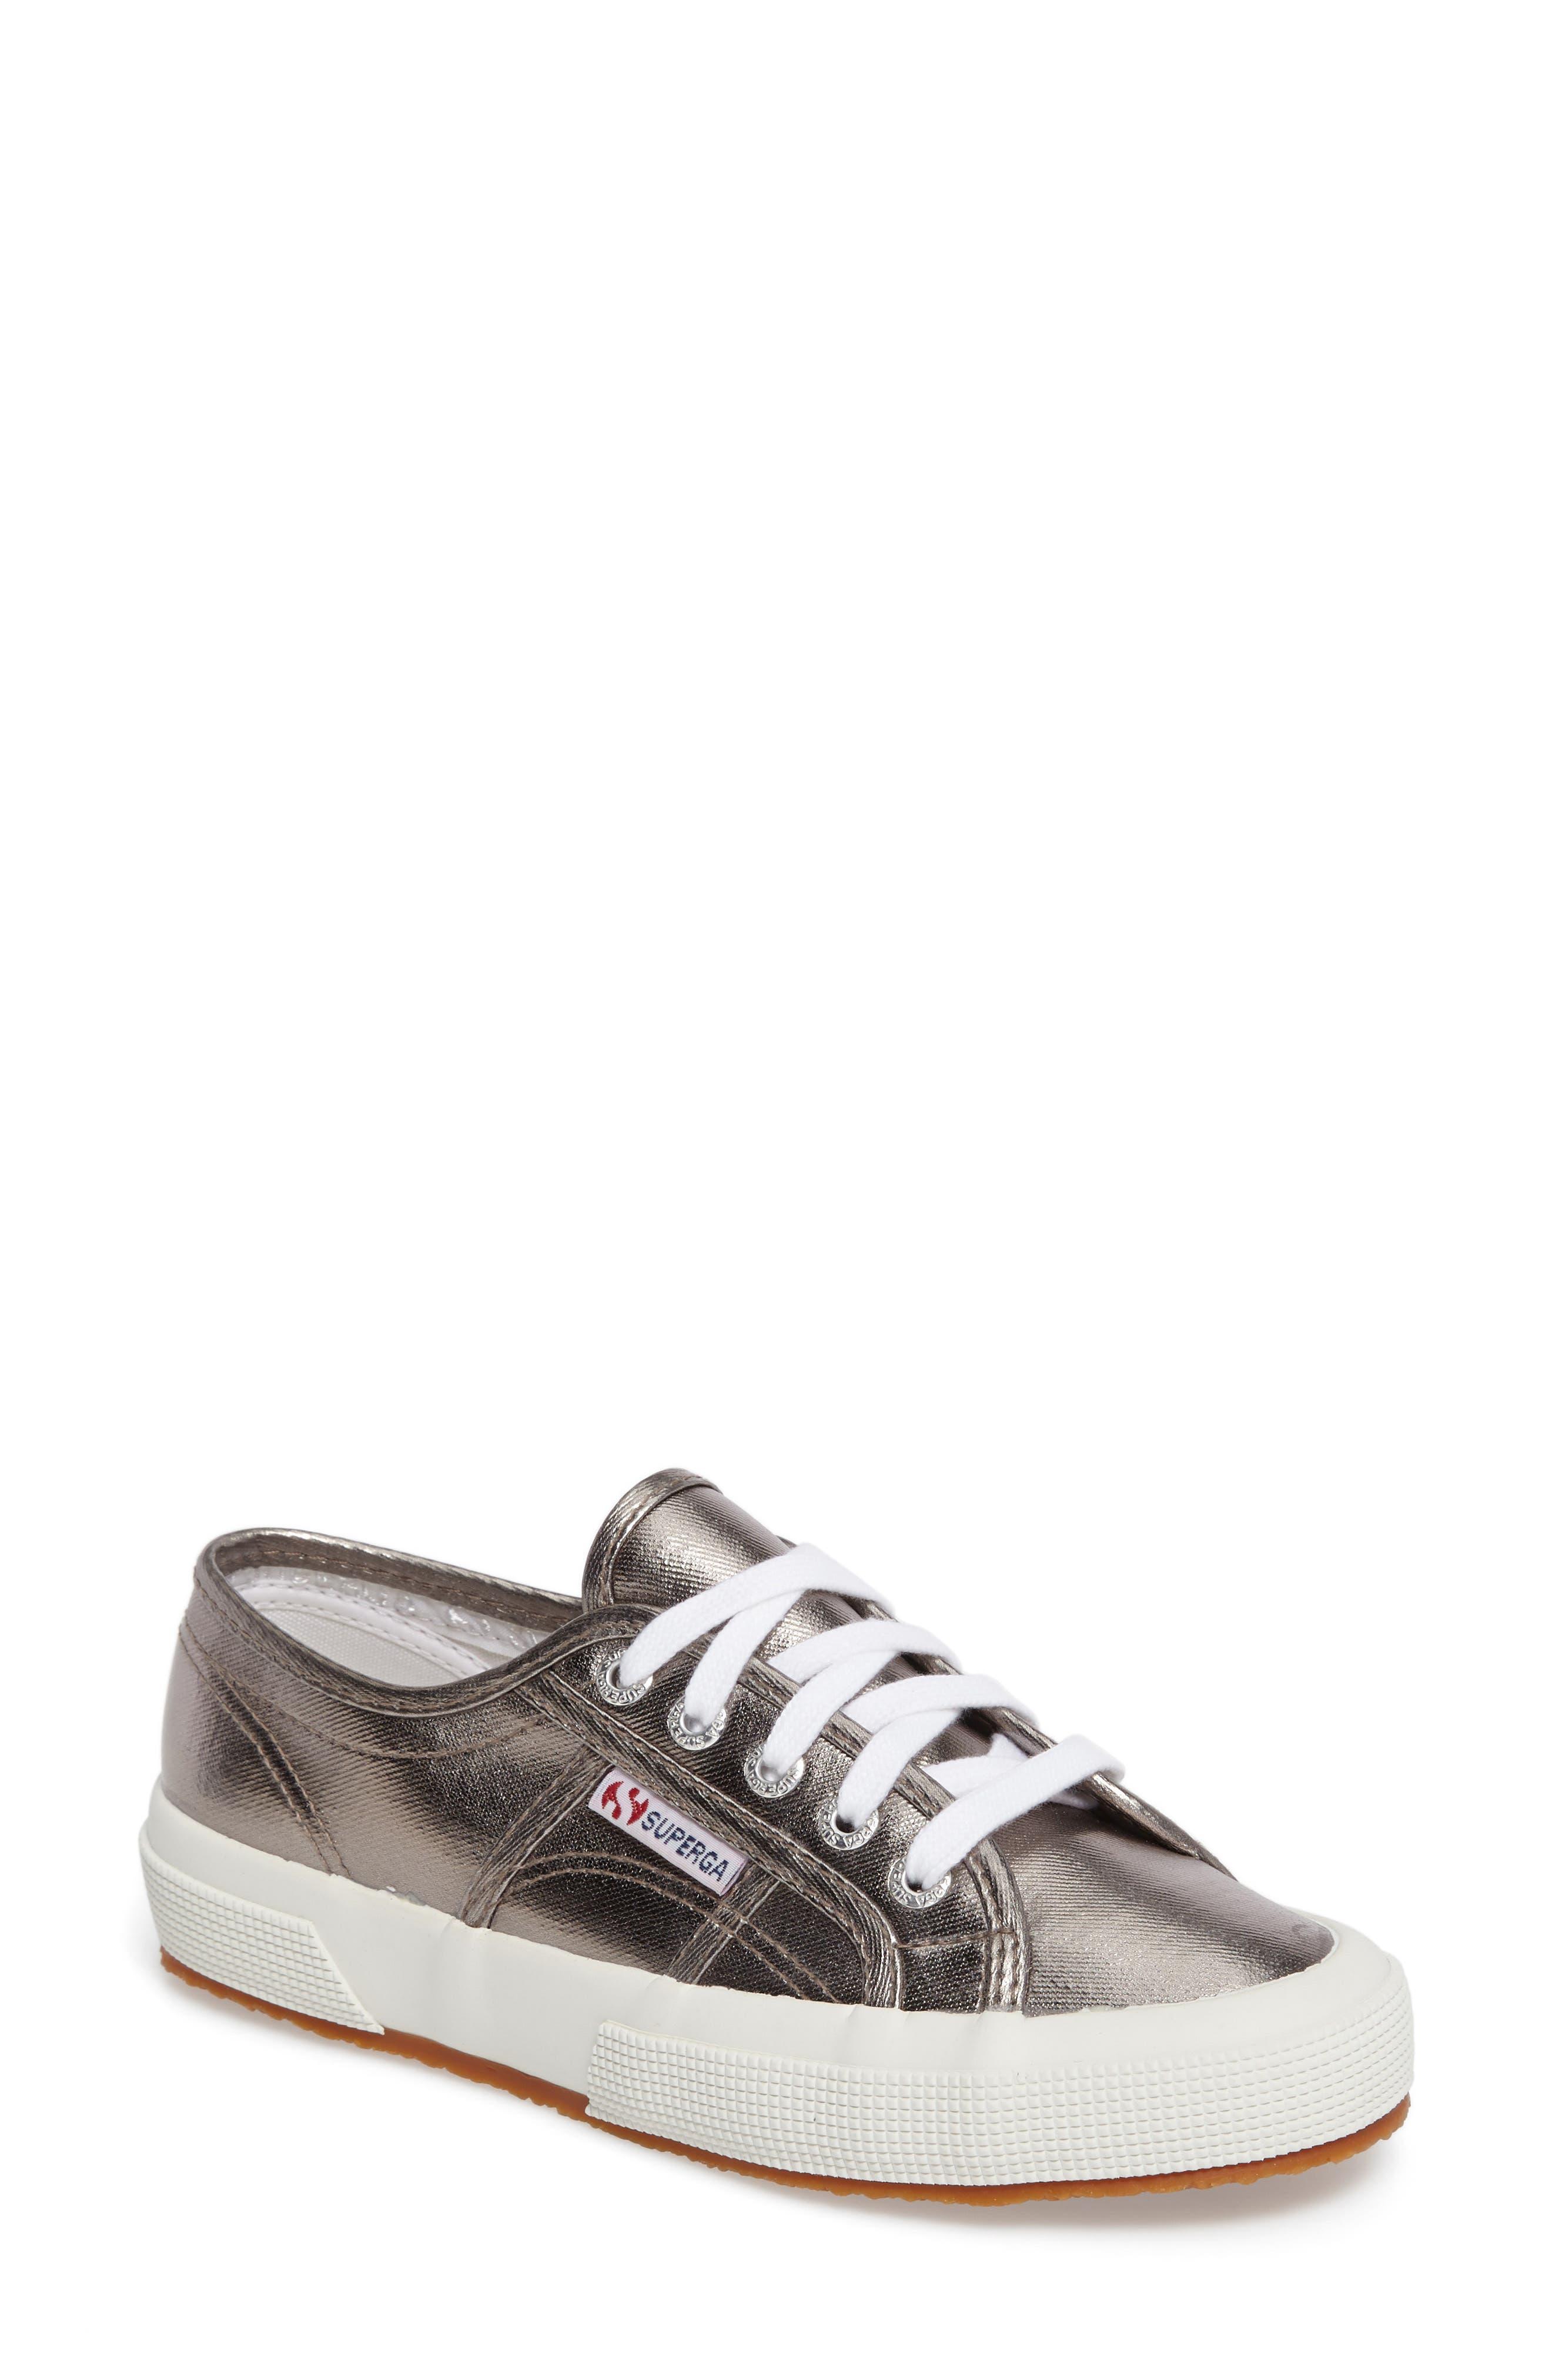 Alternate Image 1 Selected - Superga 'Cotmetu' Metallic Sneaker (Women)